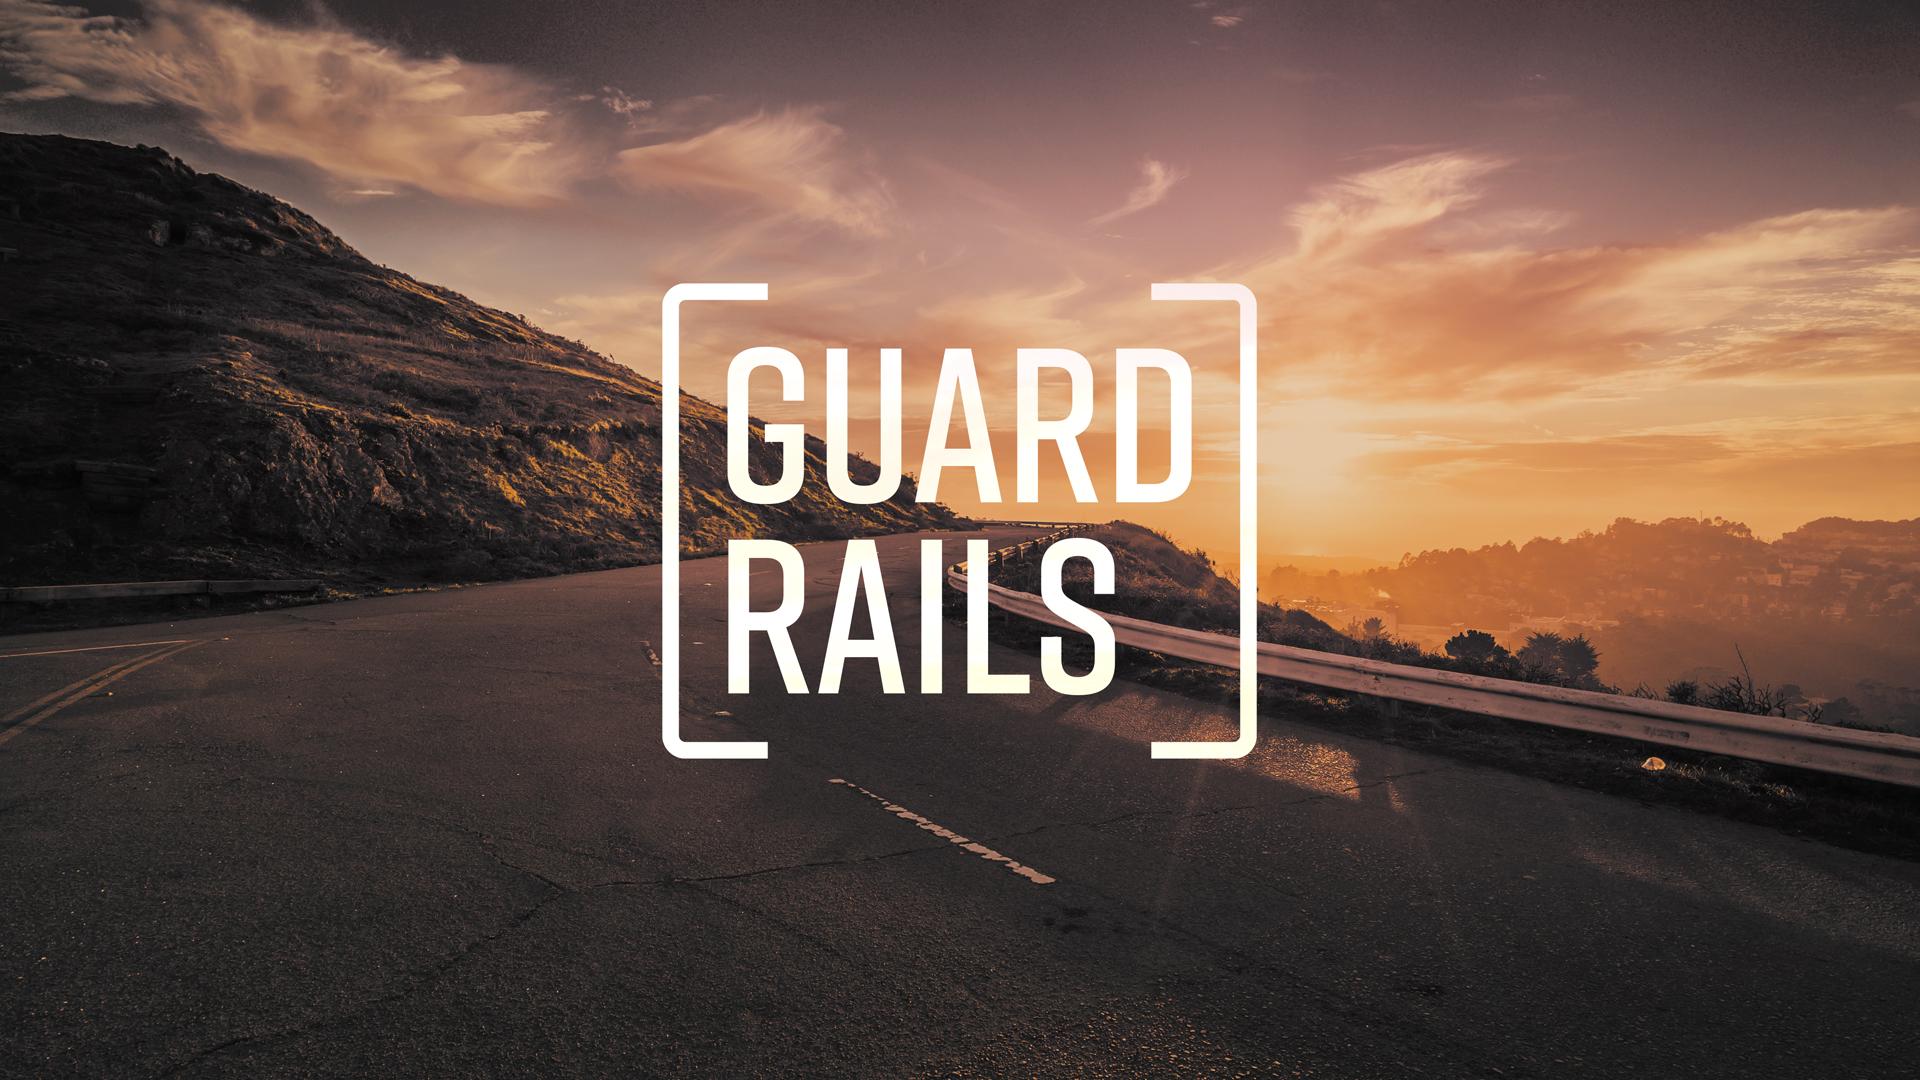 - Guardrails 3: Money MattersJune 2, 2019Speaker: JJ Williams